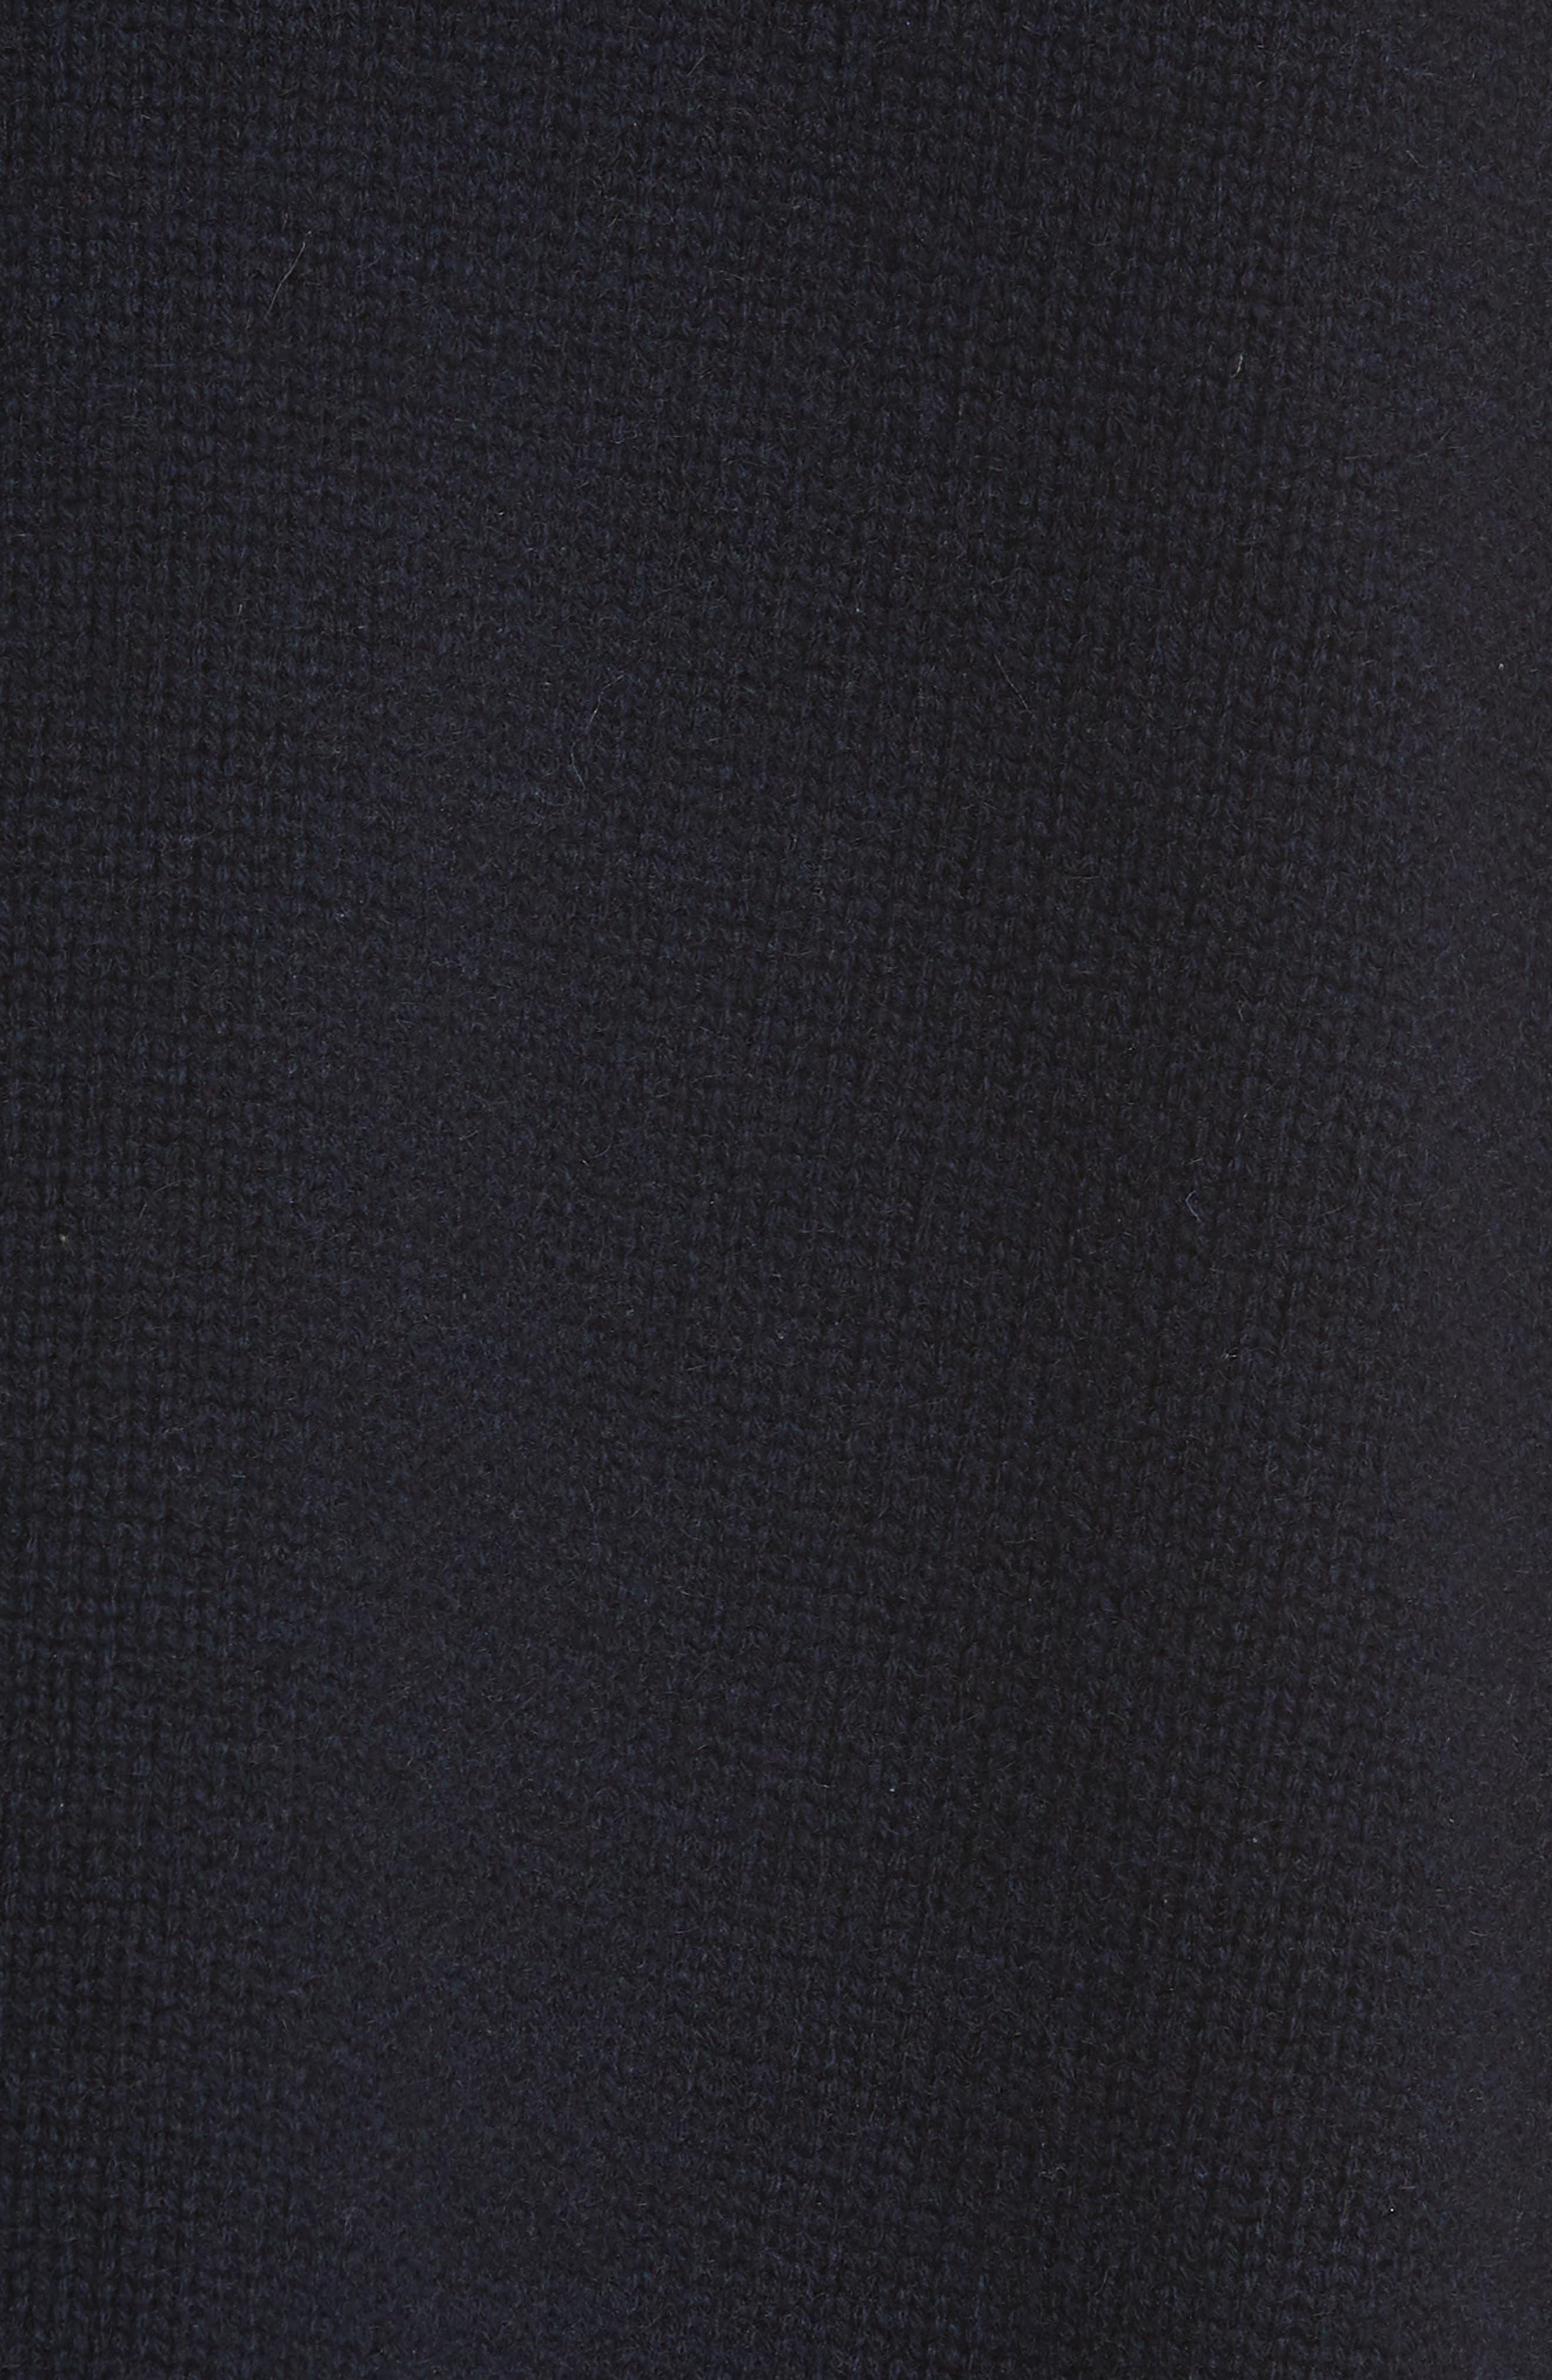 Serinda Wool & Cashmere Turtleneck Sweater,                             Alternate thumbnail 5, color,                             Dark Navy